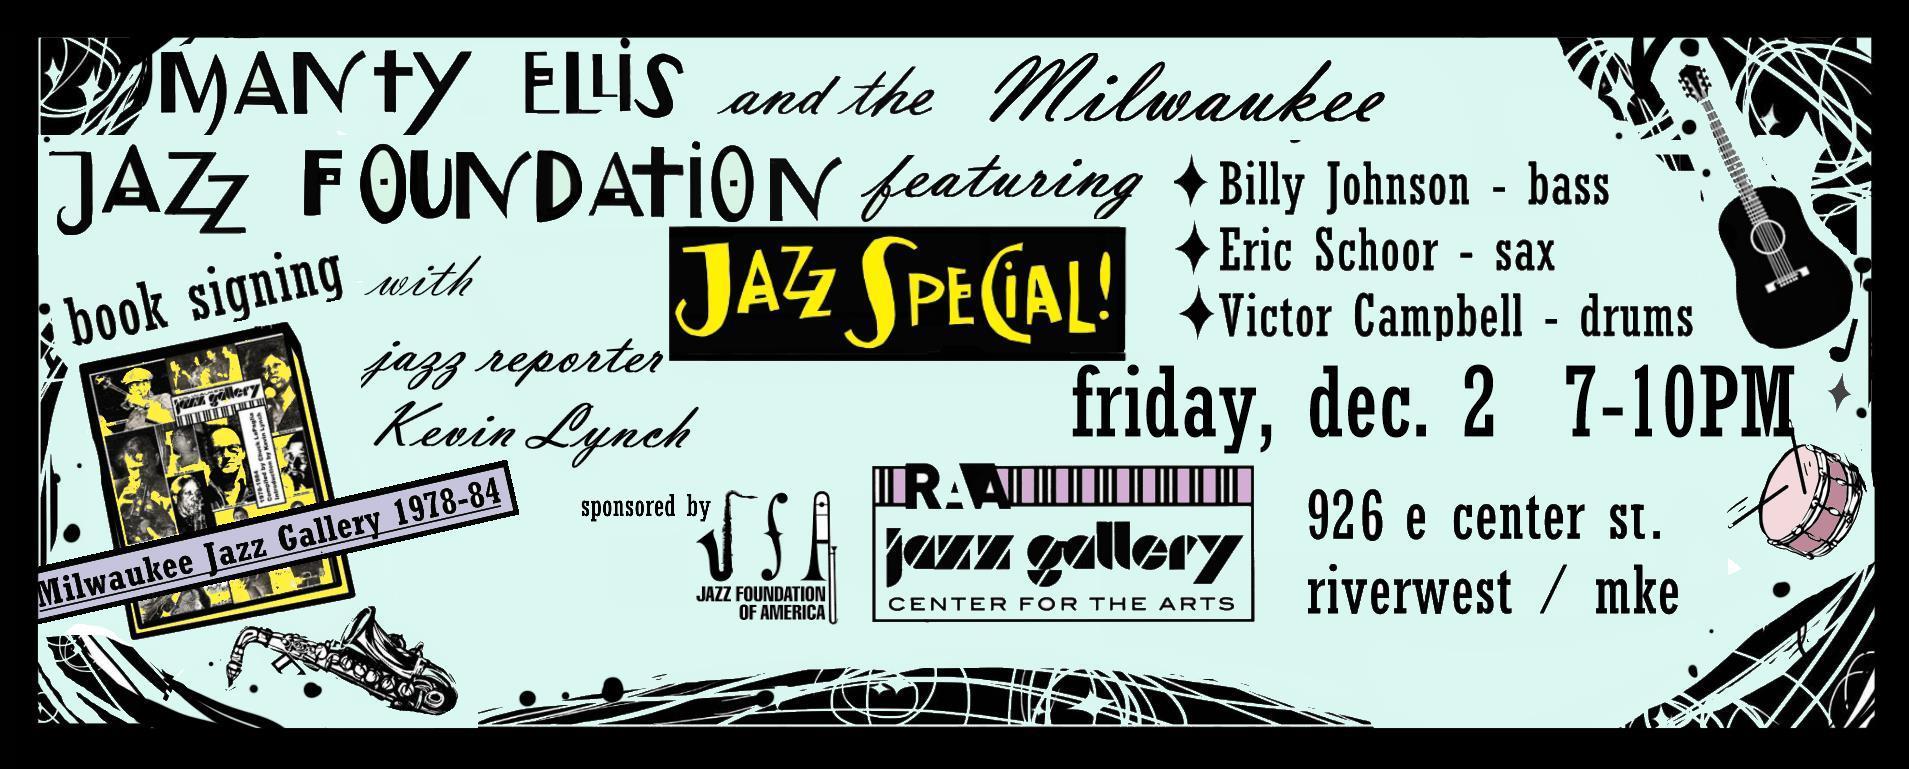 manty-ellis-jazz-foundation-fb-shortj